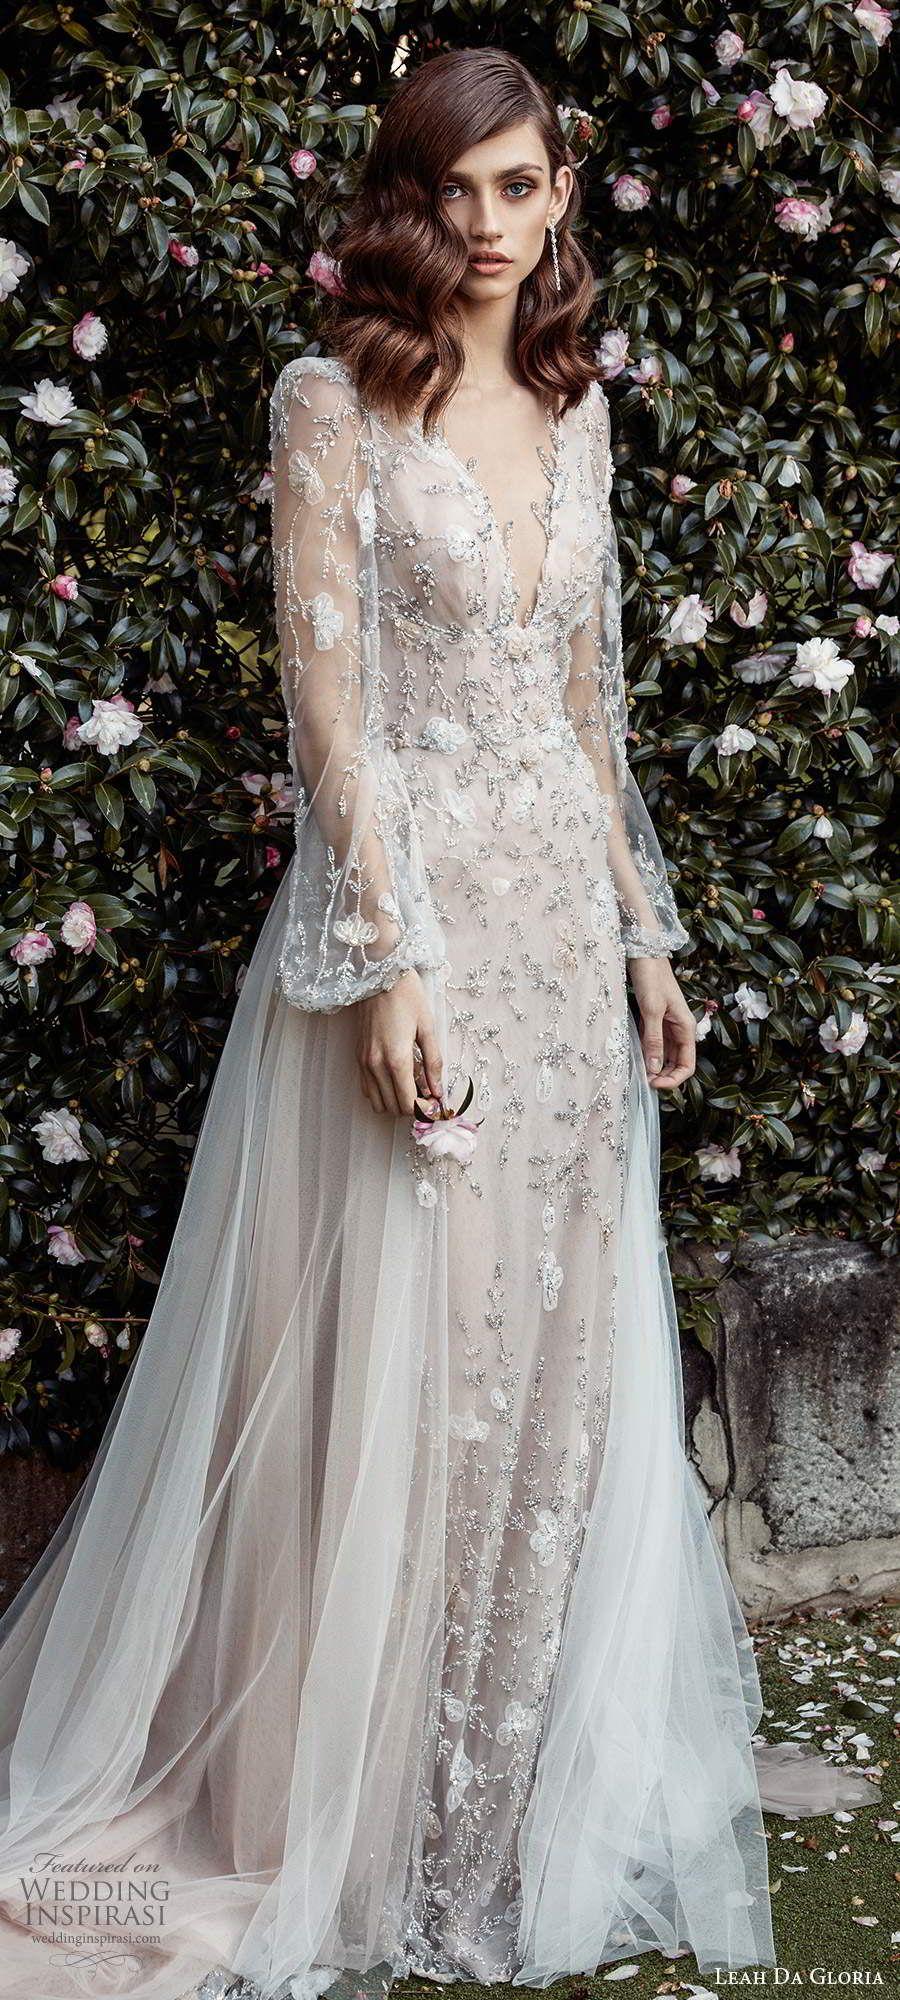 Photo of Leah Da Gloria 2020 Couture Wedding Dresses | Wedding Inspirasi